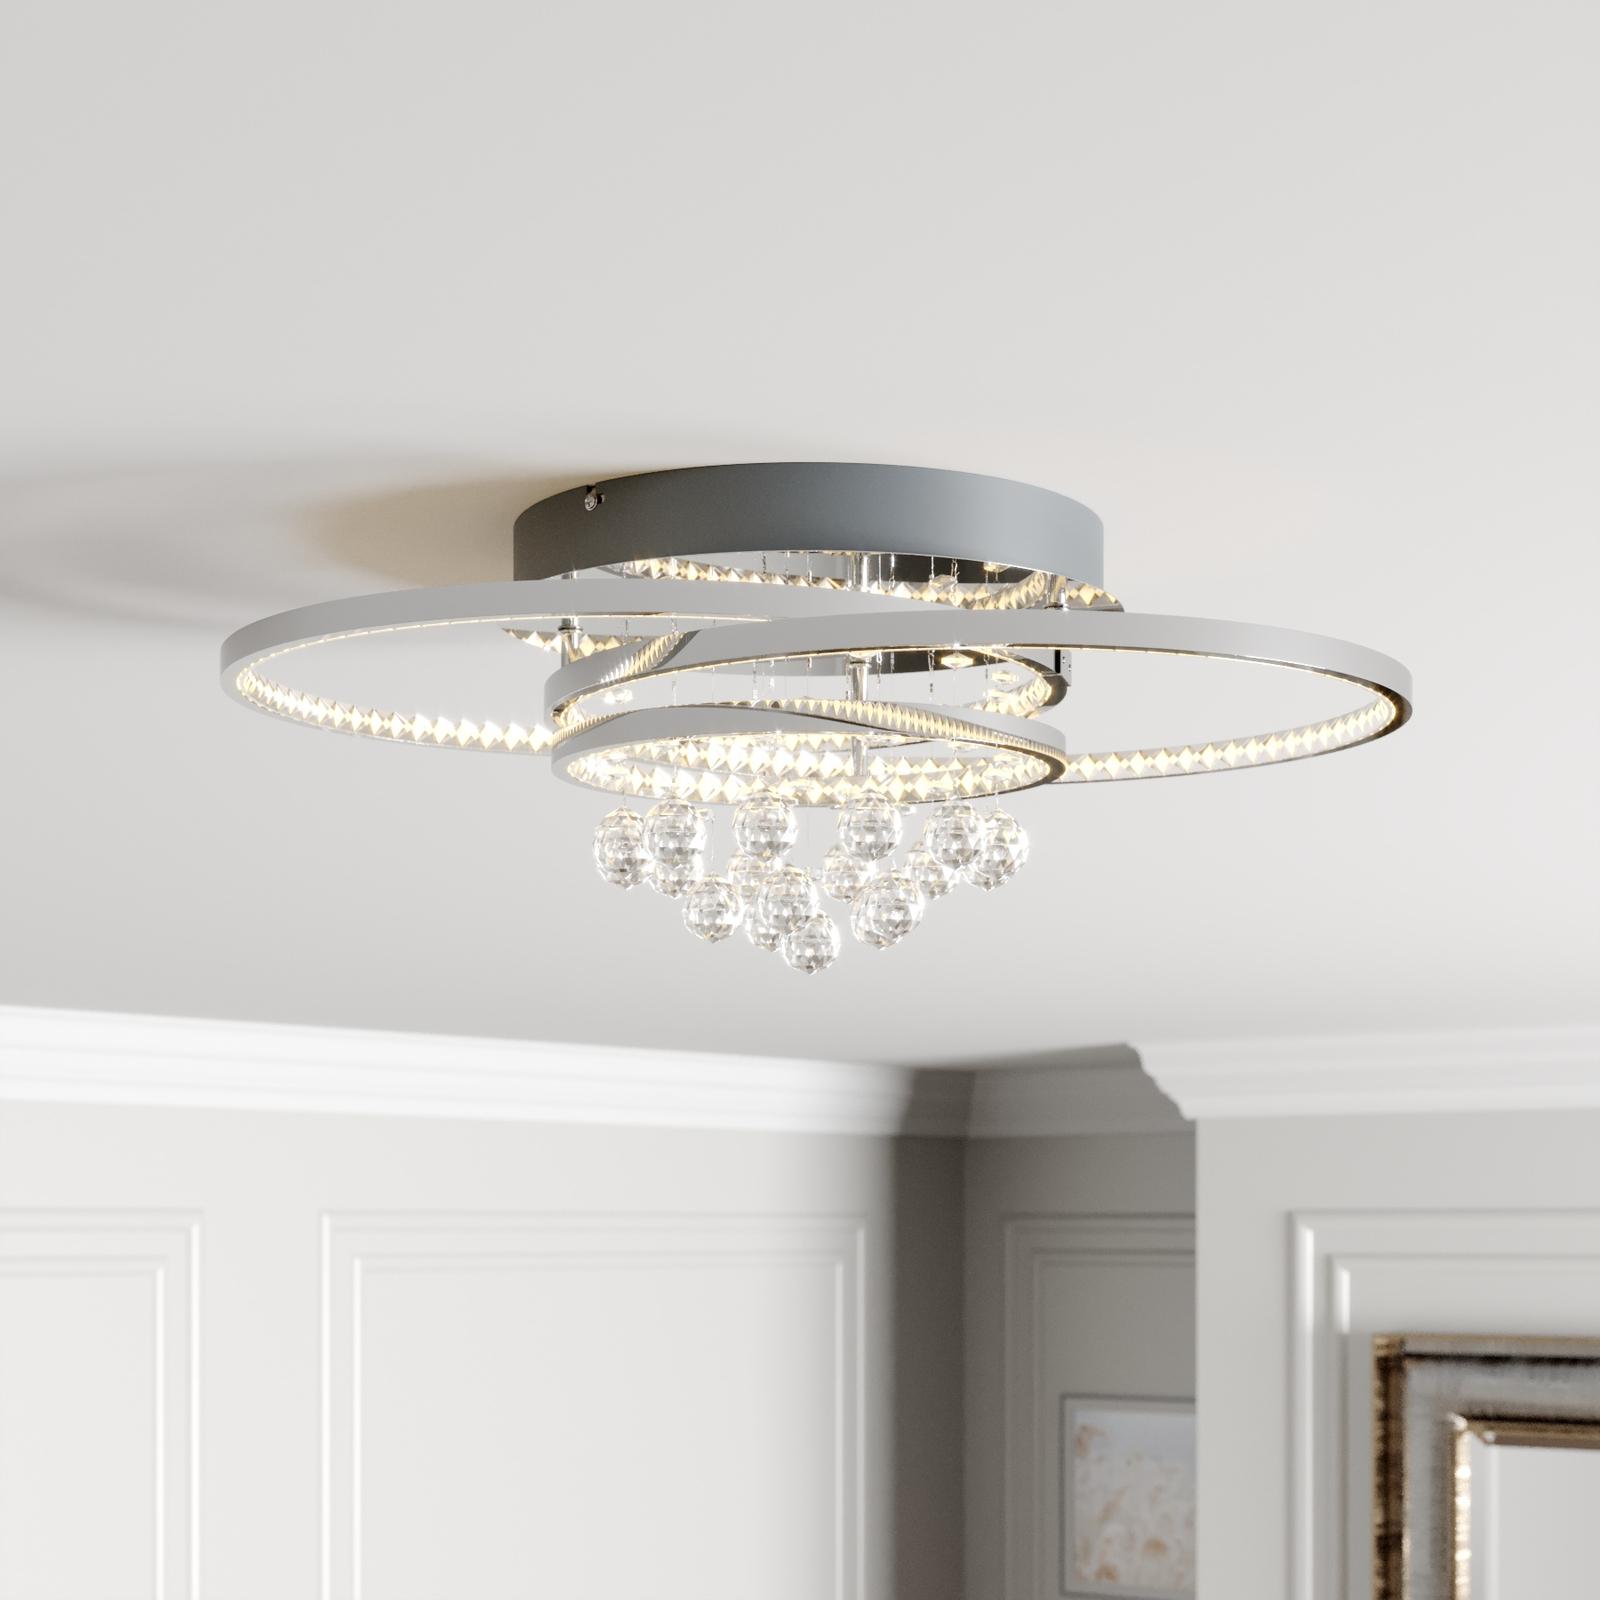 Lucande Keely LED-Deckenleuchte Kristall, 56,5 cm